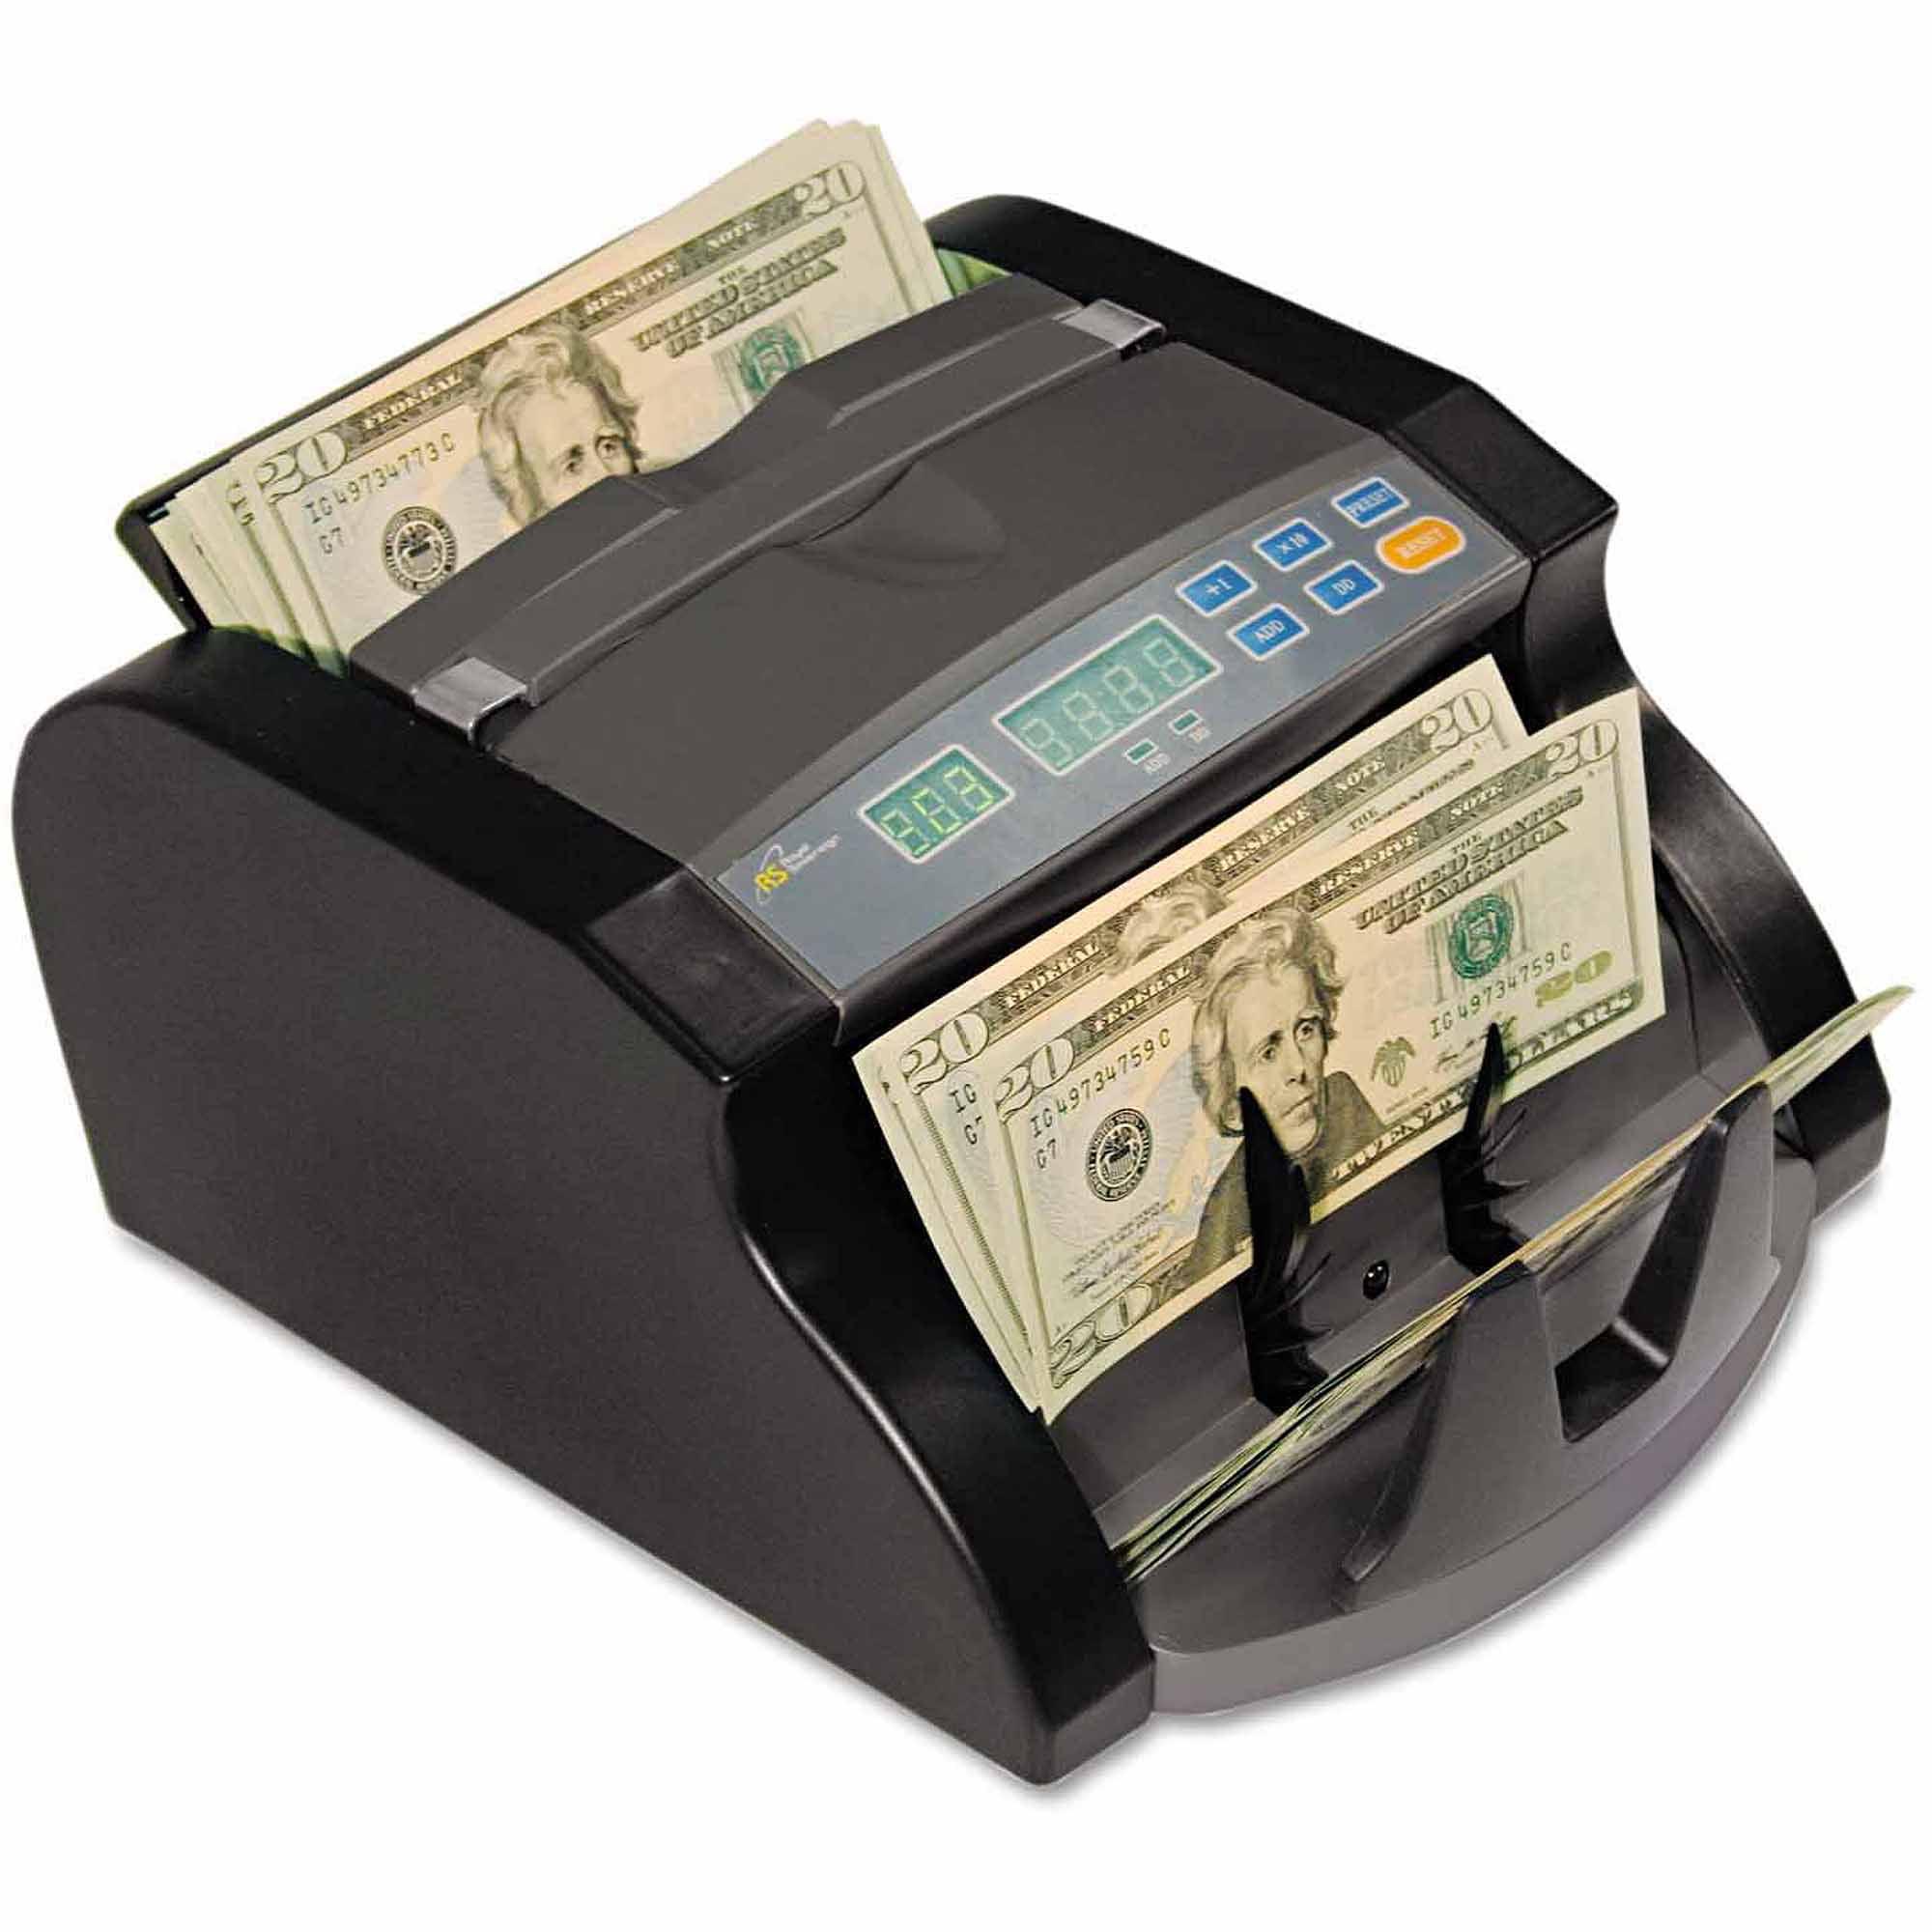 "Royal Sovereign Electric Bill Counter, 1000 Bills/Min, 10-63/100W"" x 9-45/100""D x 6-1/10"", Black/Gray"